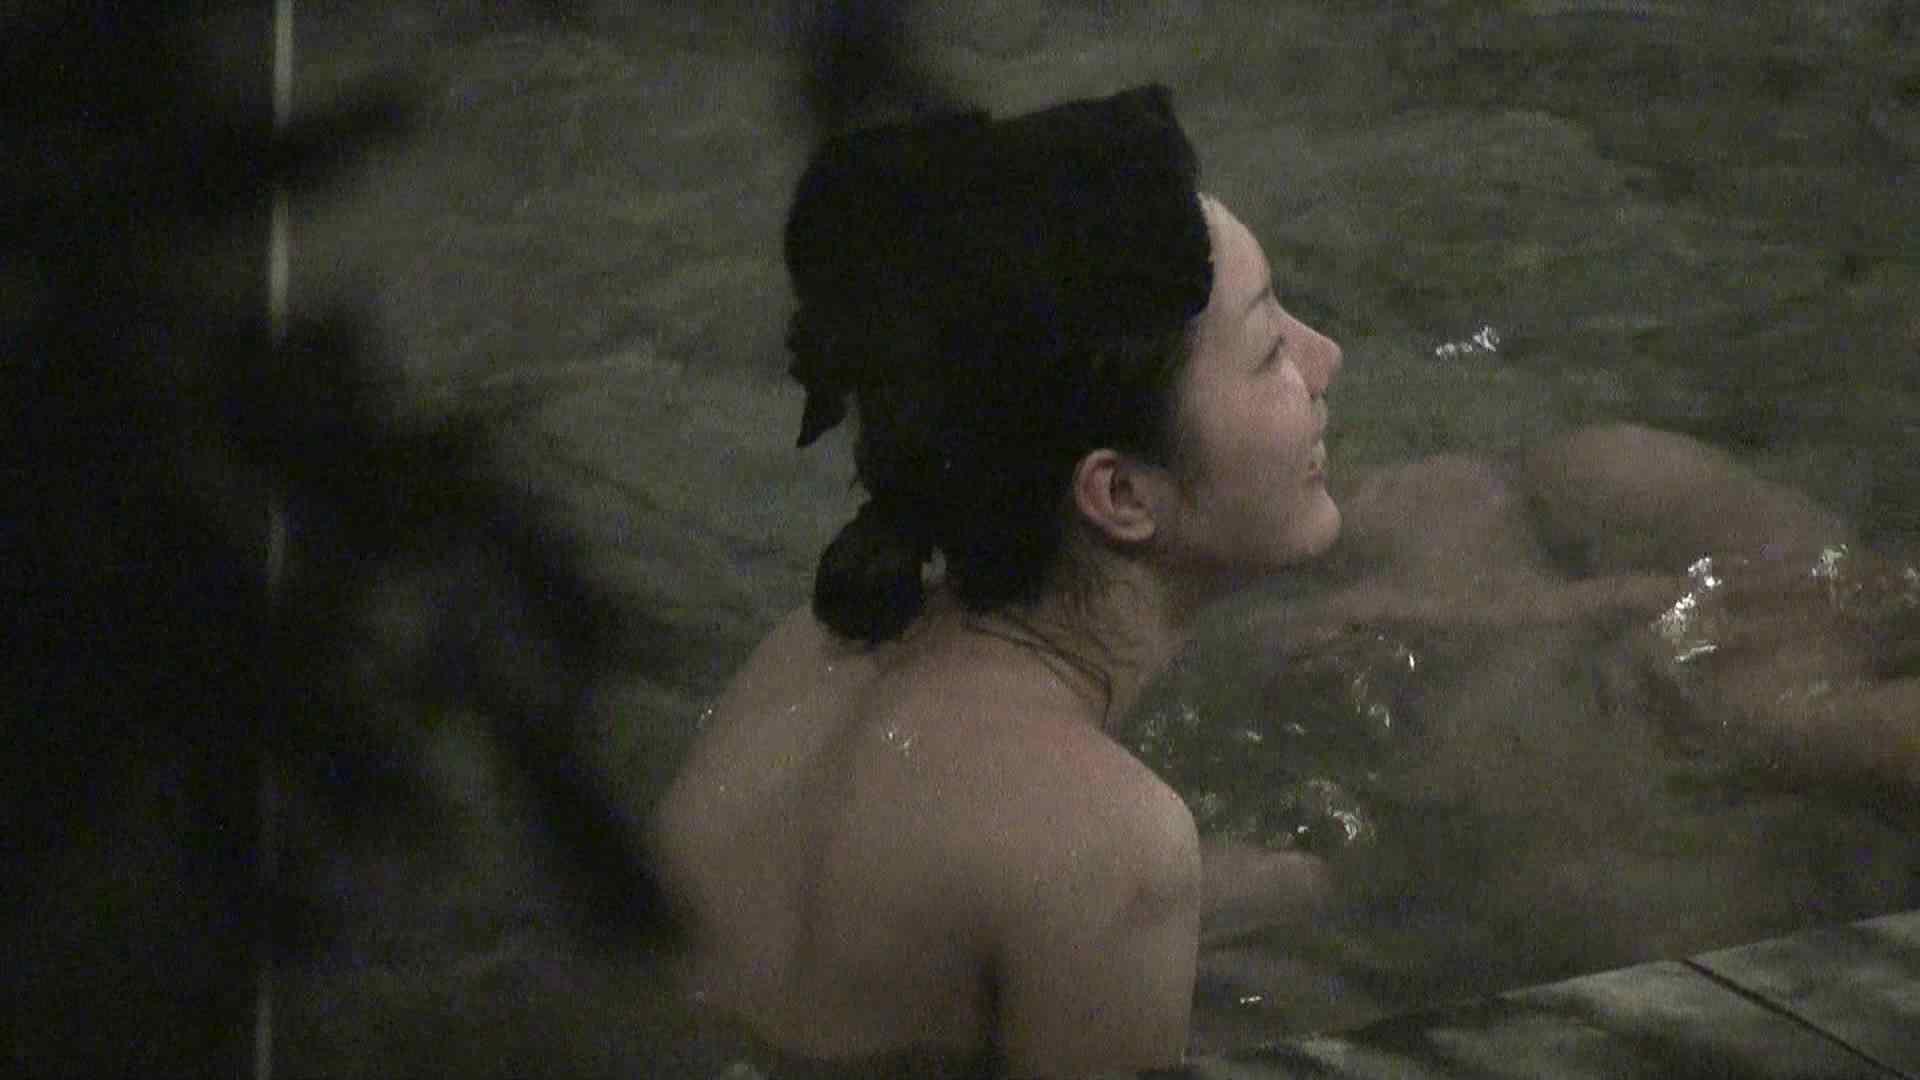 Aquaな露天風呂Vol.315 0 | 0  66連発 49